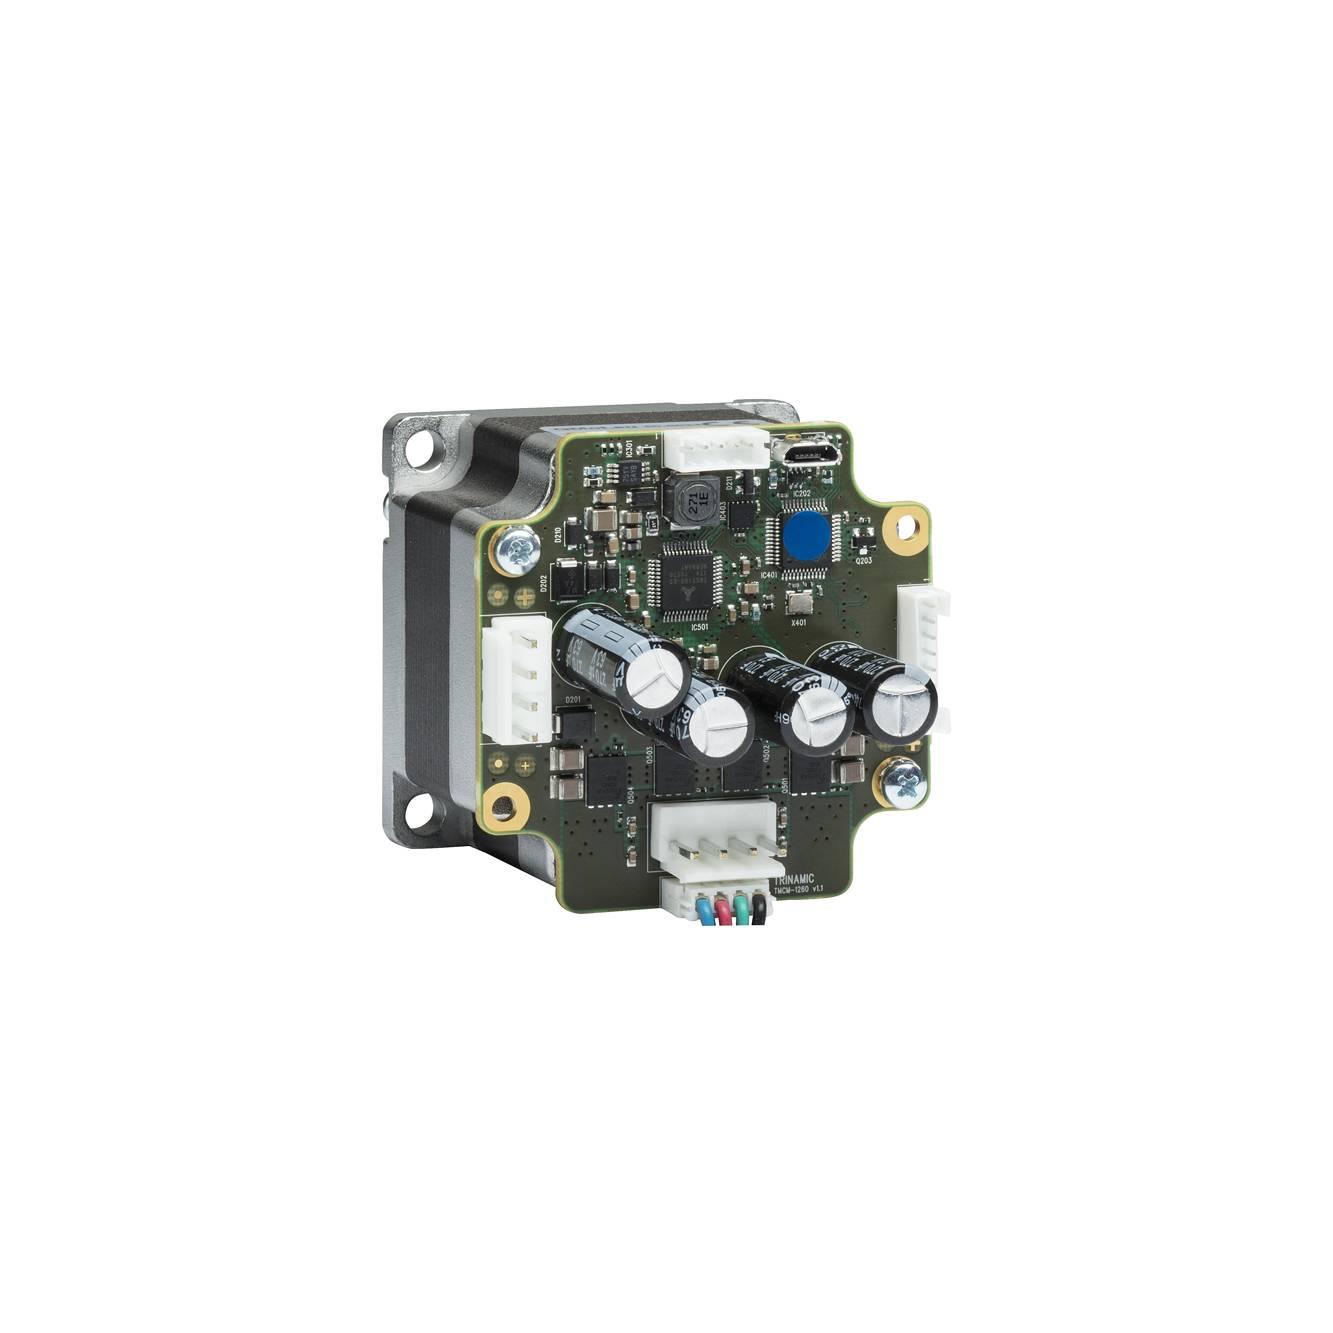 PD57-1-1260-TMCL